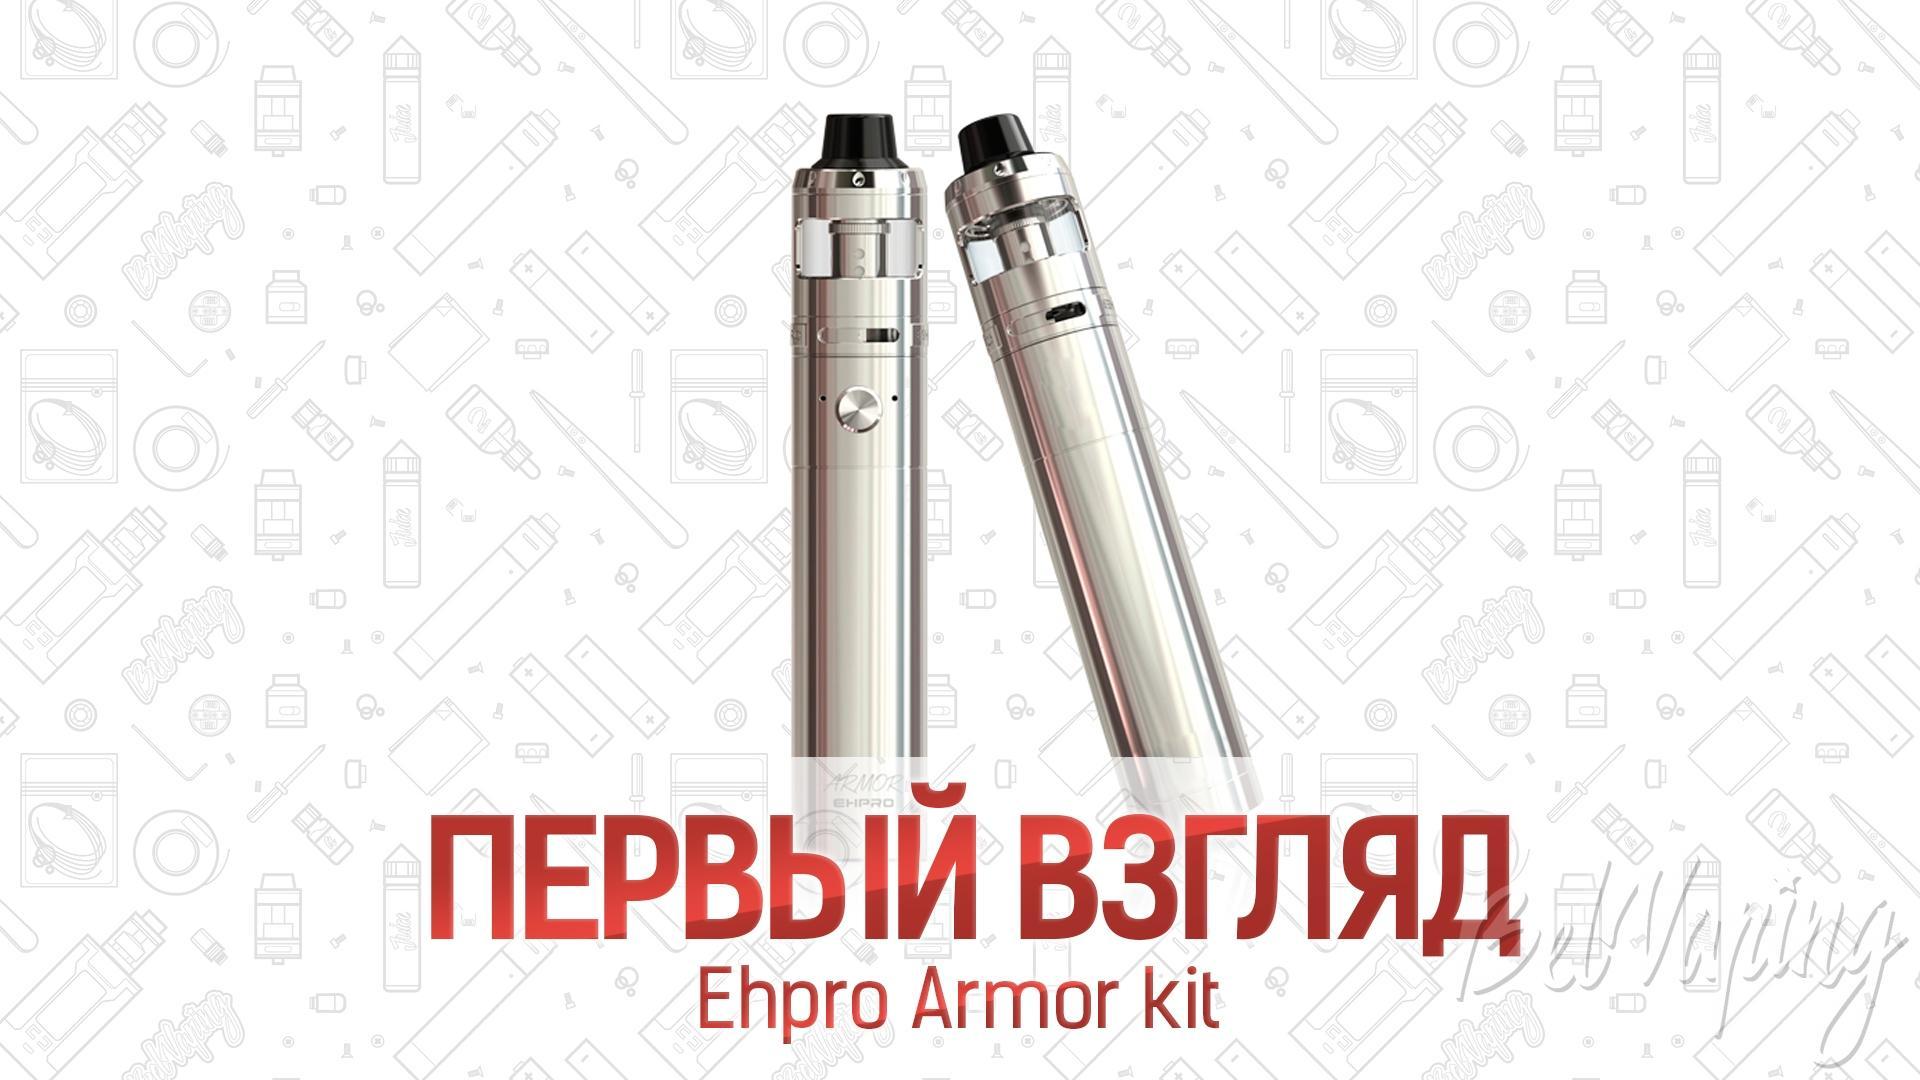 Ehpro Armor kit. Первый взгляд